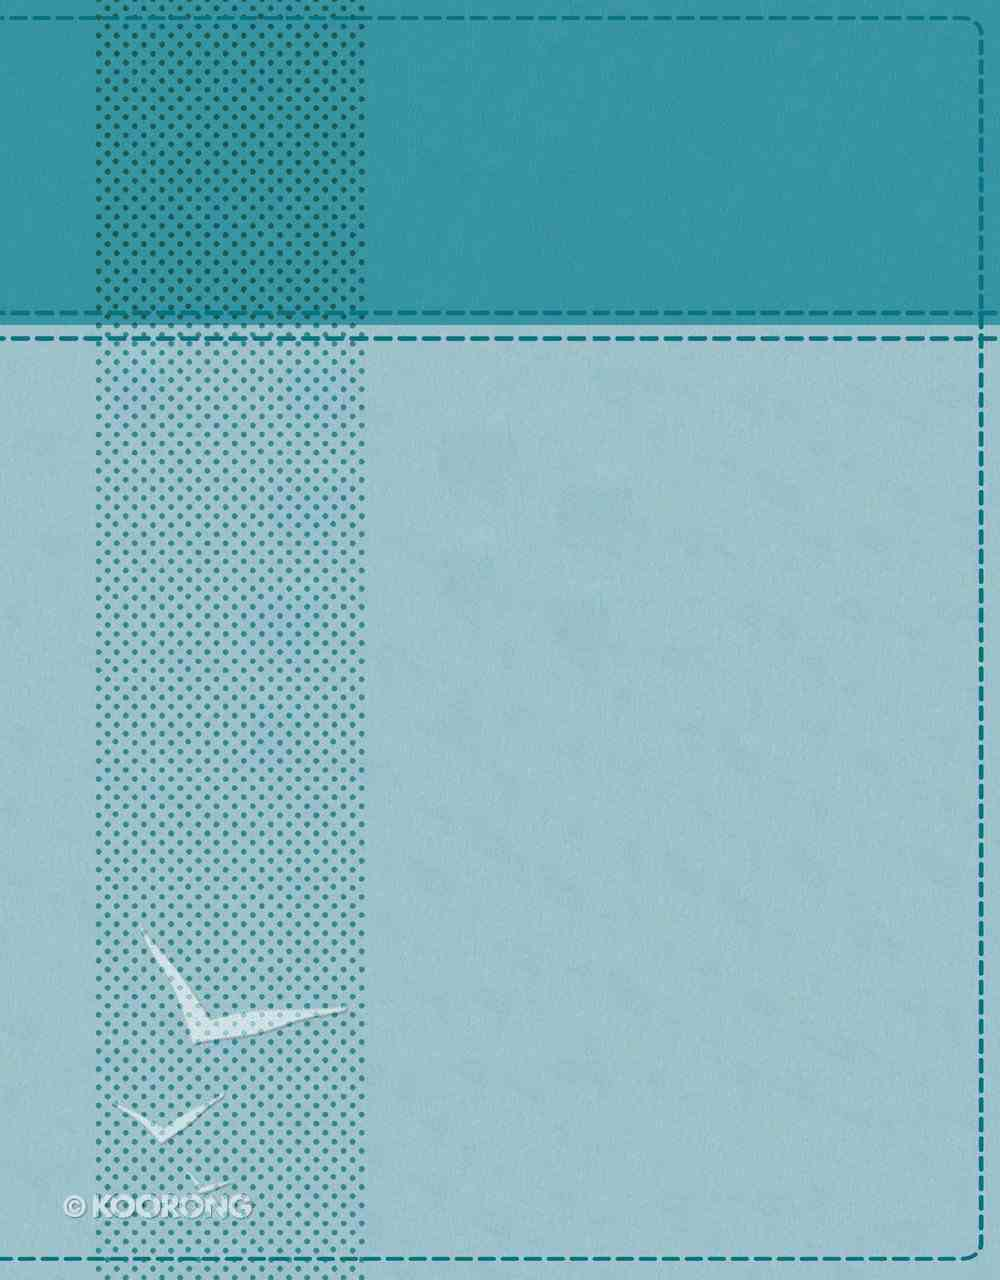 NIV Starting Place Study Bible Indexed Blue Premium Imitation Leather